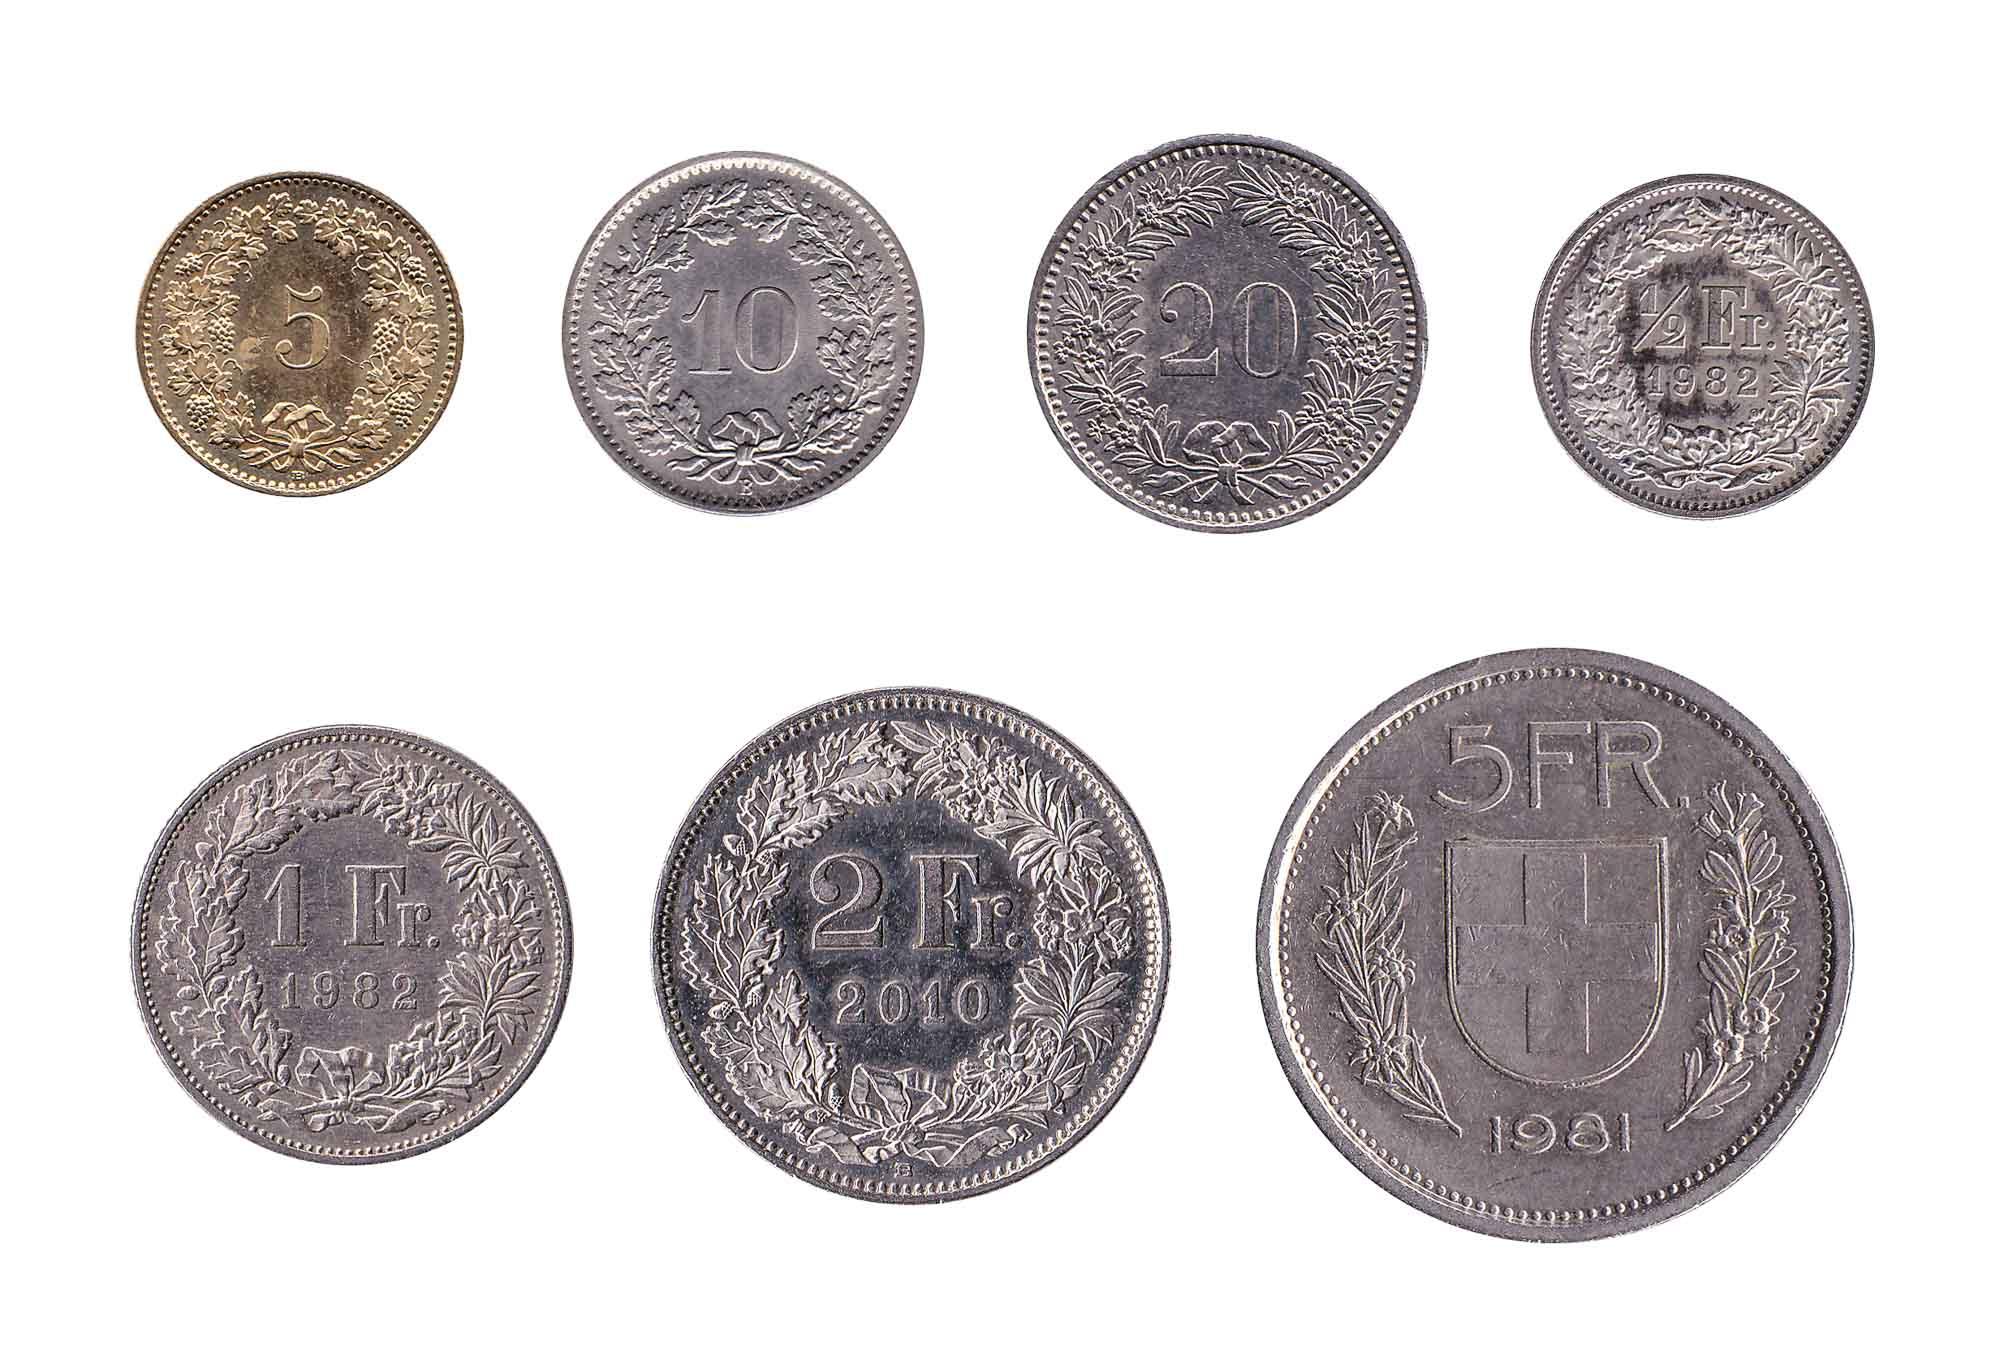 Swiss franc coins